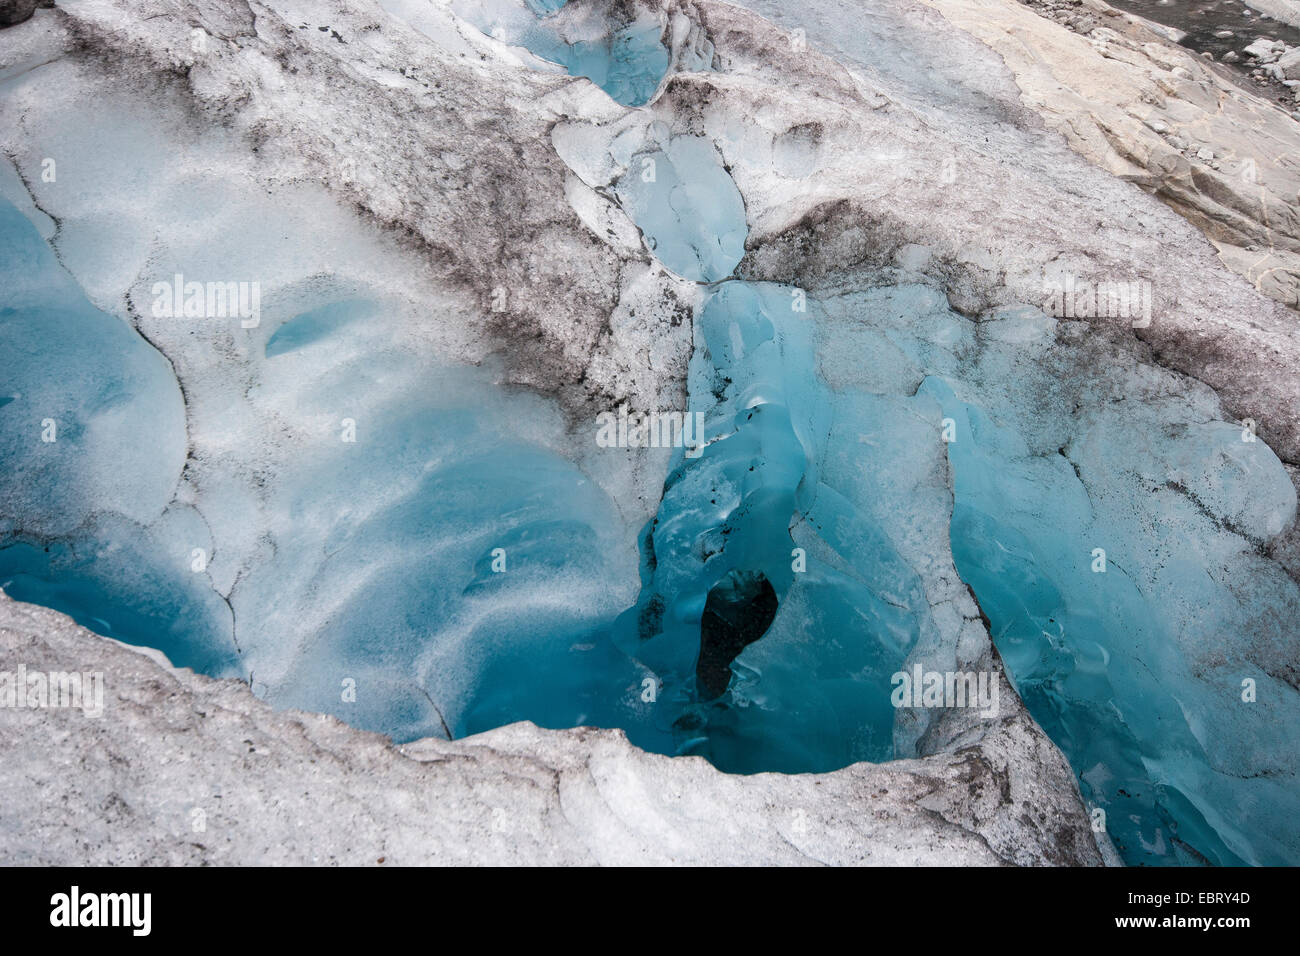 crevasse at Nigardsbreen glacier, Norway, Jostedalsbreen National Park - Stock Image